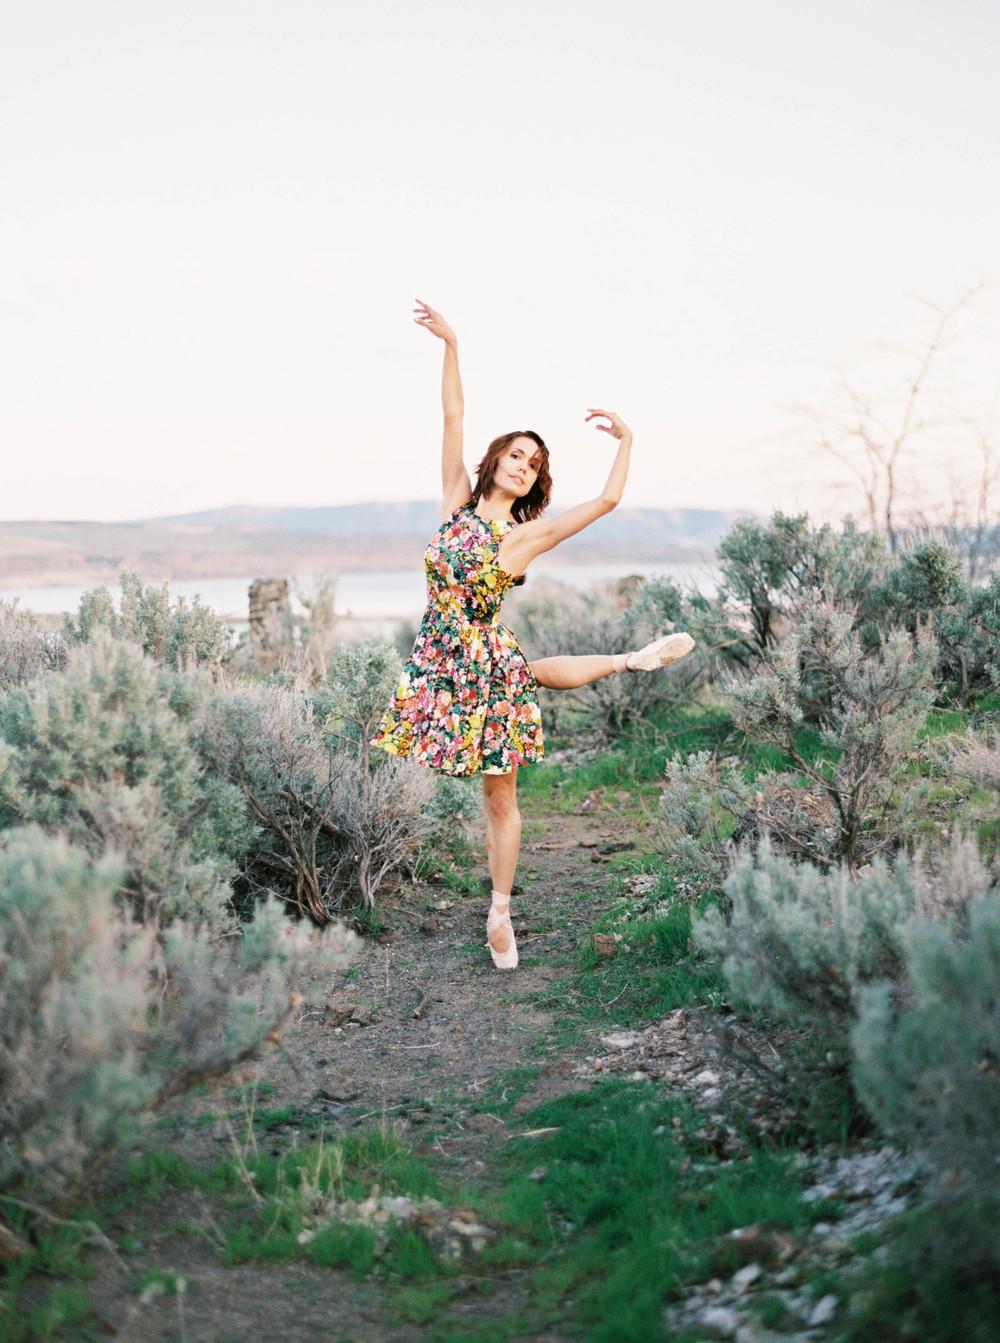 sarah_carpenter_portra800_contax645_ginkgo_state_park_vantage_washington_pacific_northwest_ballet_photovisionprints.jpg